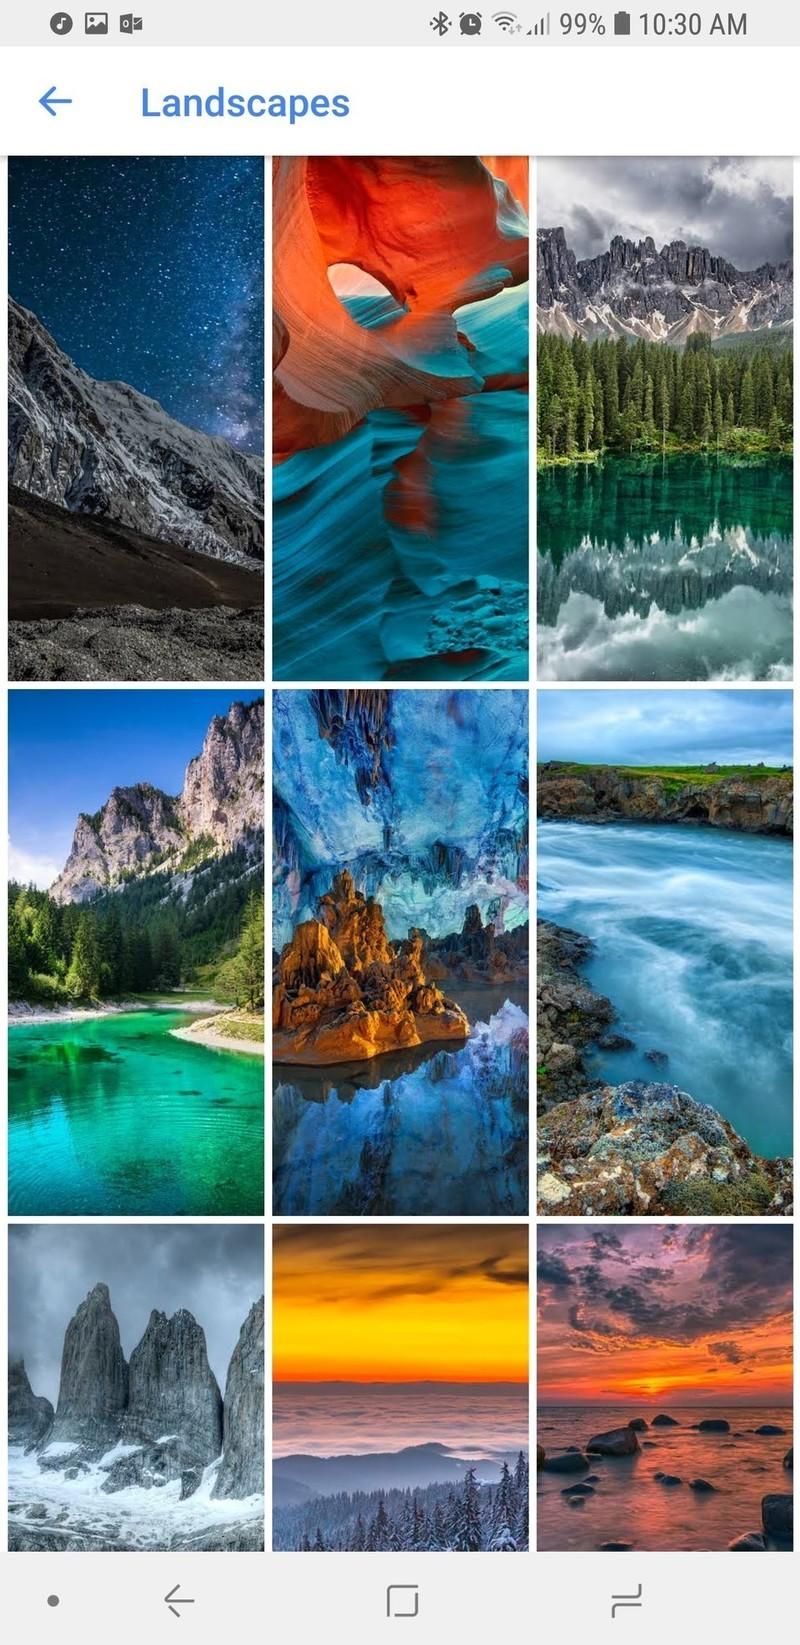 google-wallpapers-landscapes-s9plus.jpg?